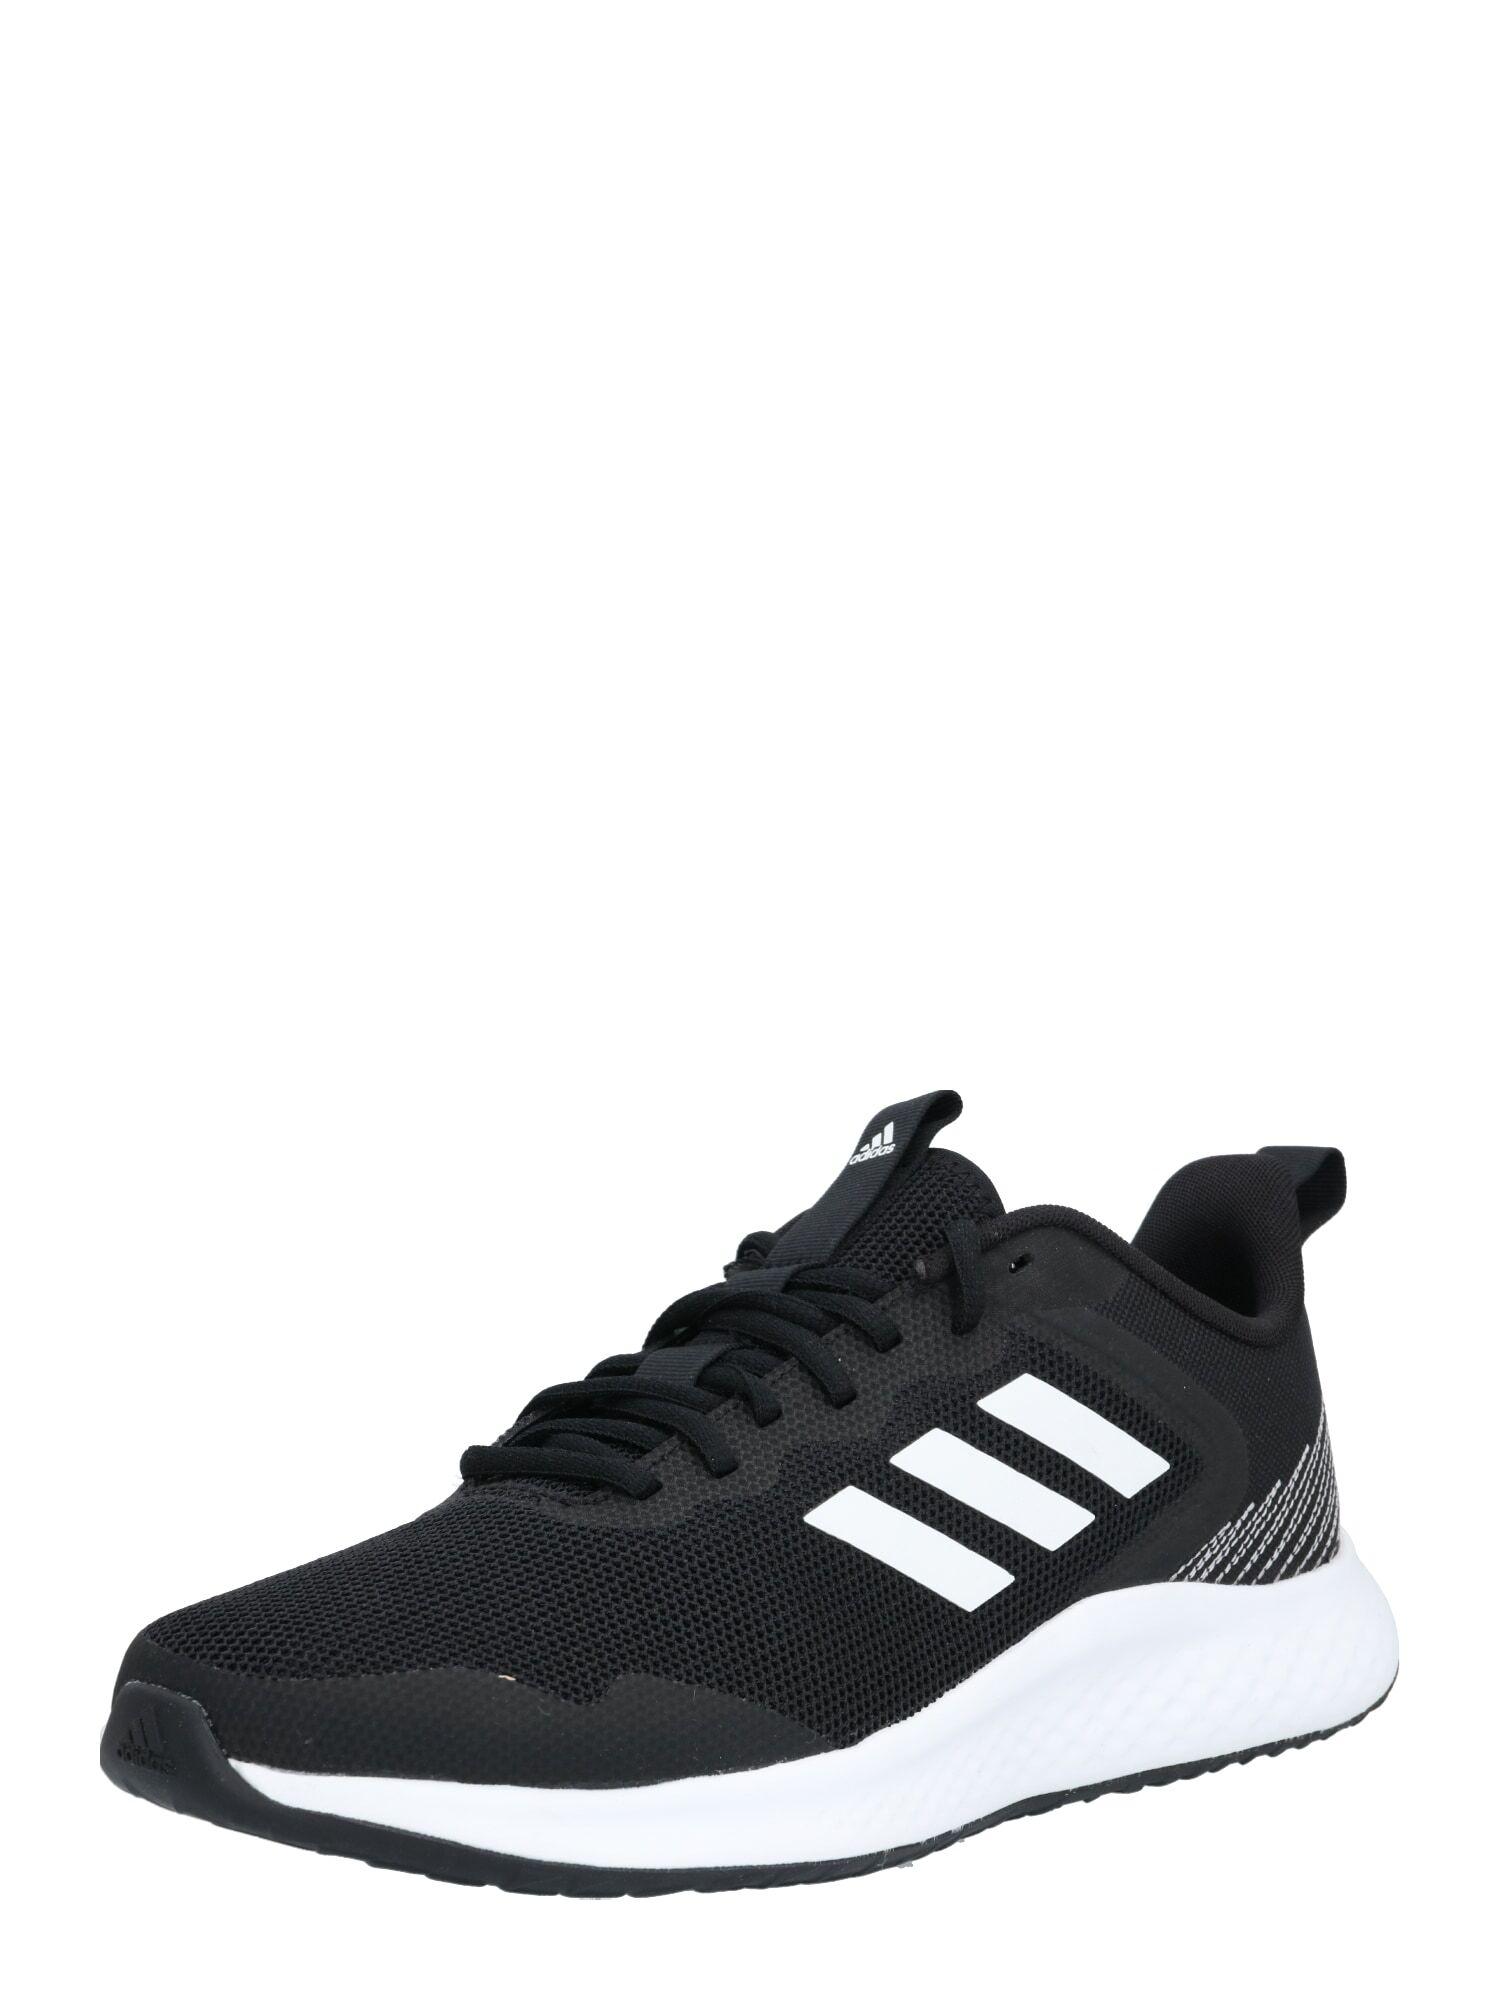 ADIDAS PERFORMANCE Chaussure de course 'Fluid Street'  - Noir - Taille: 7.5 - male